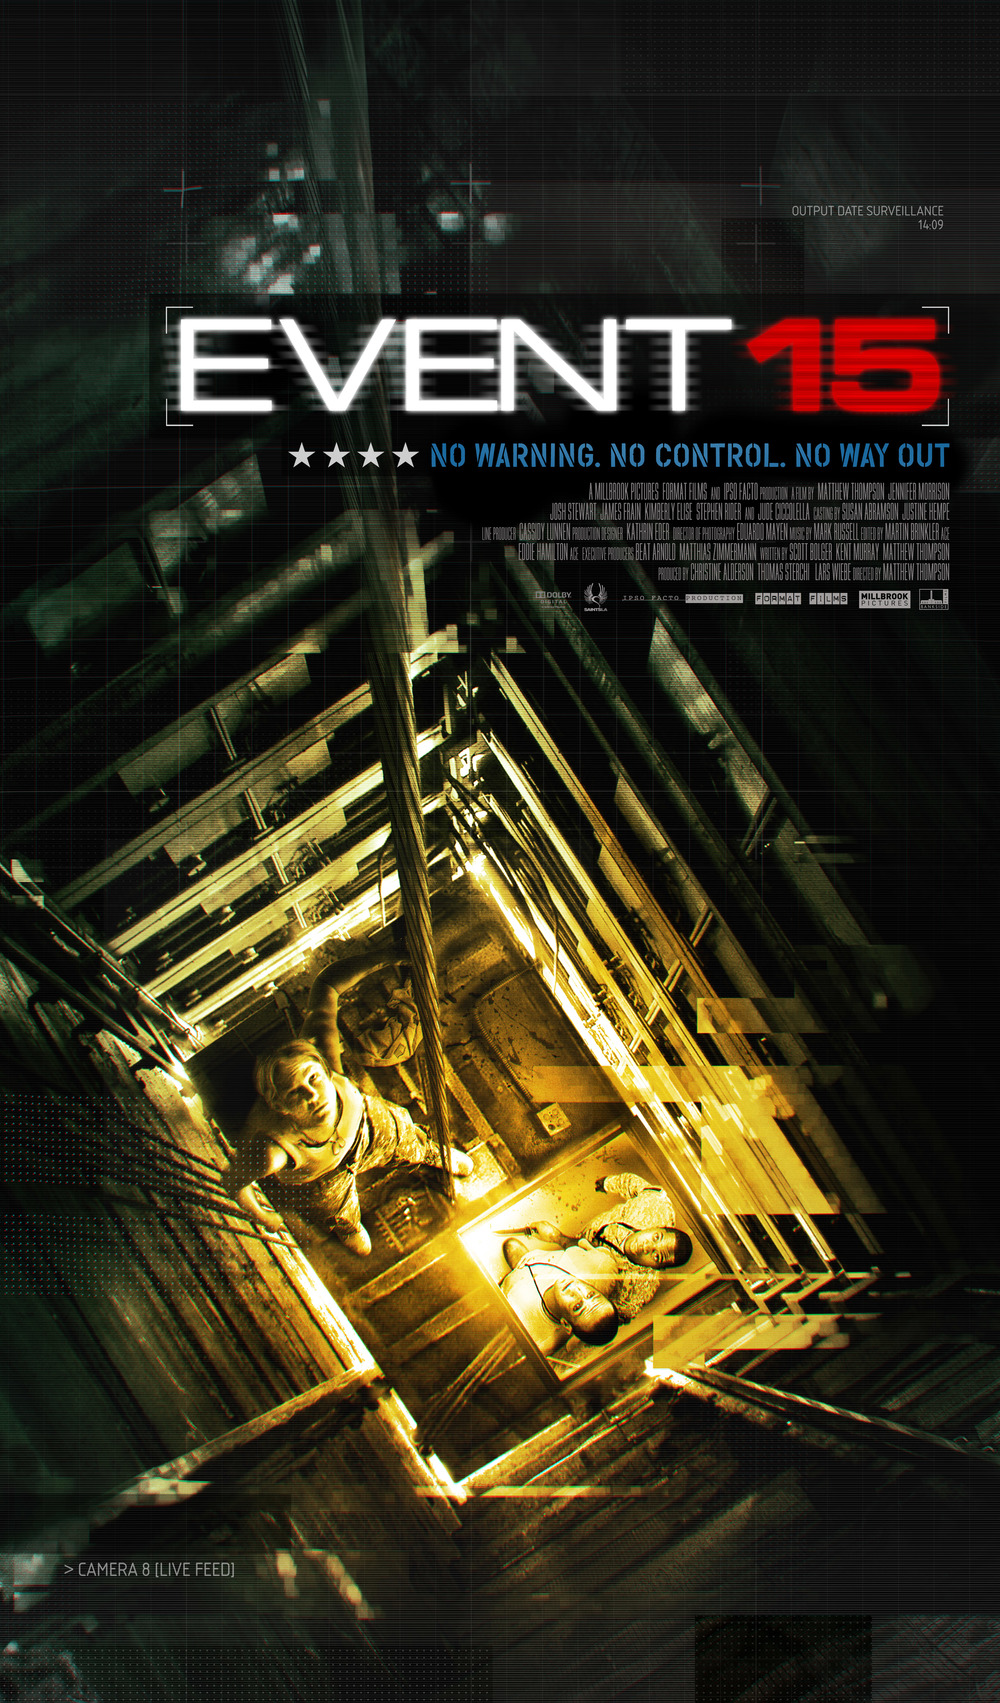 Event 15 (2013) Movie